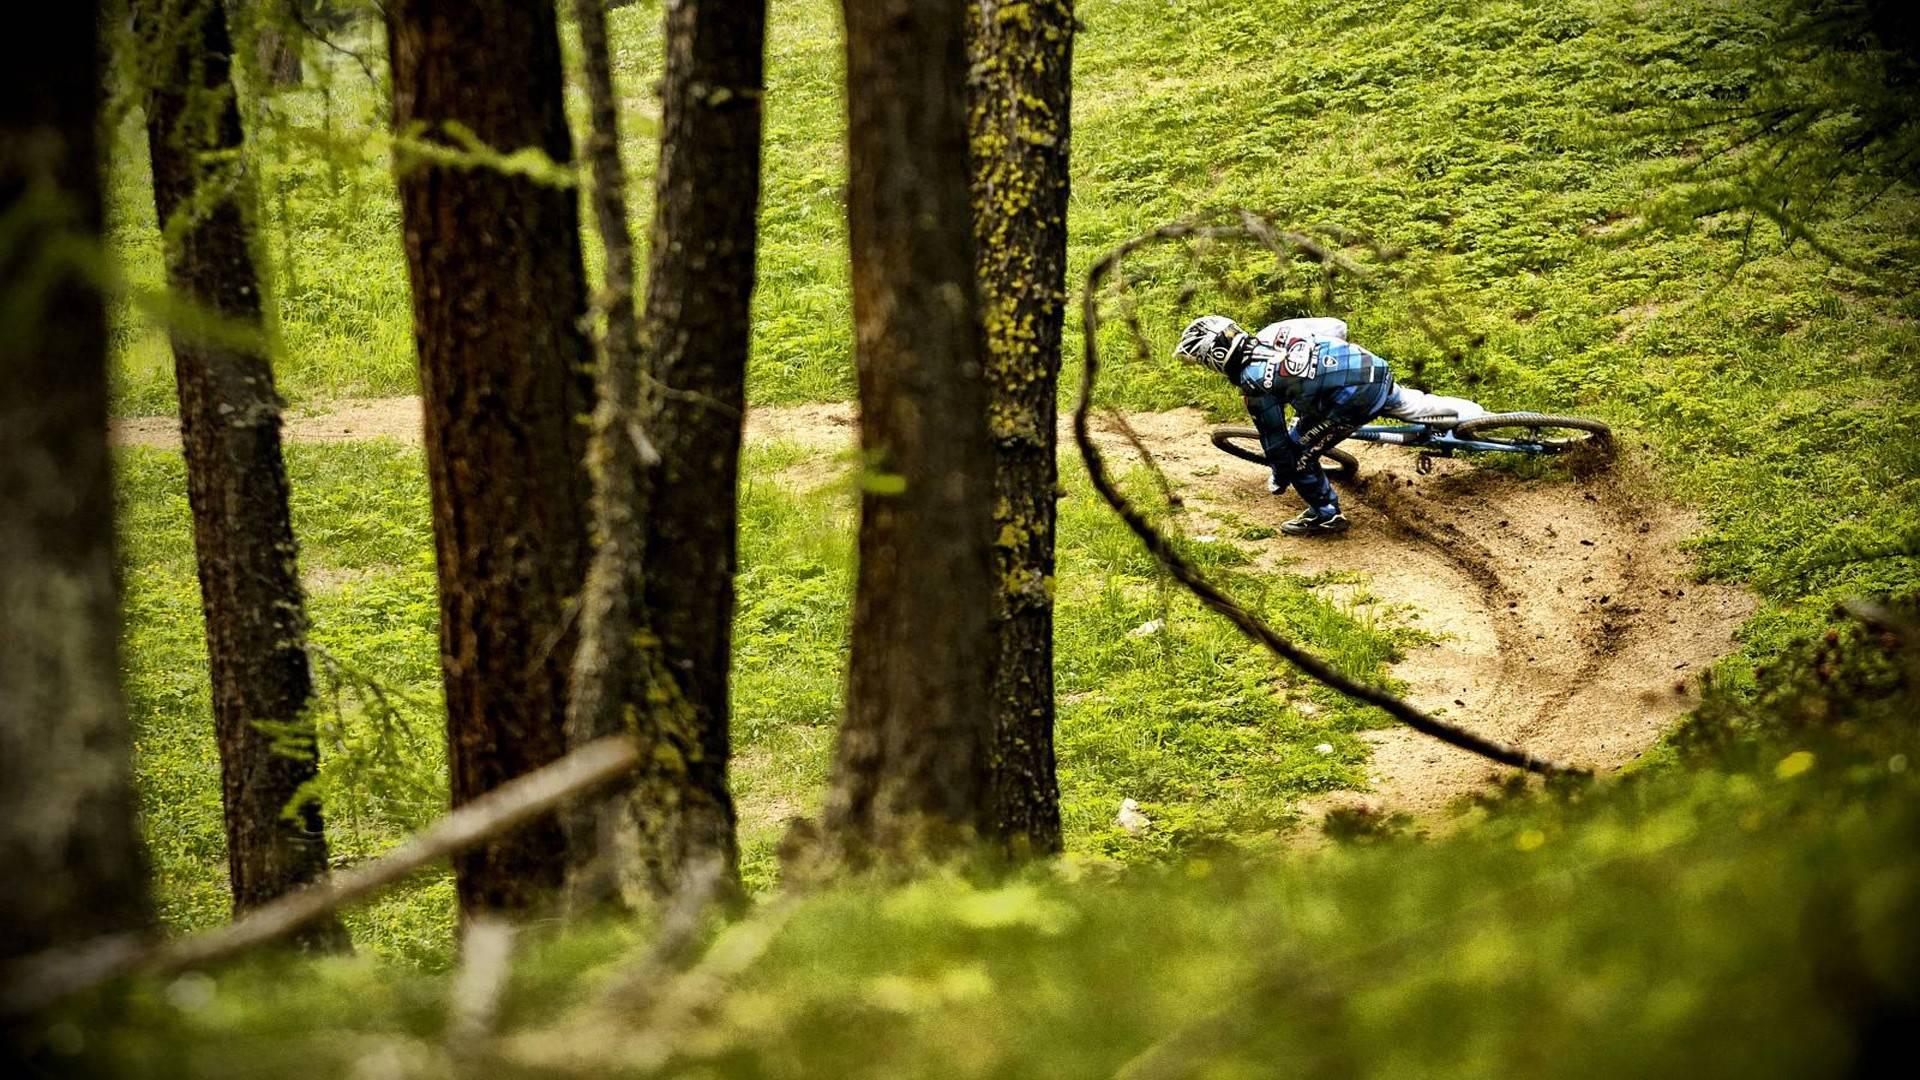 Mountain Bike Desktop Wallpapers Top Free Mountain Bike Desktop